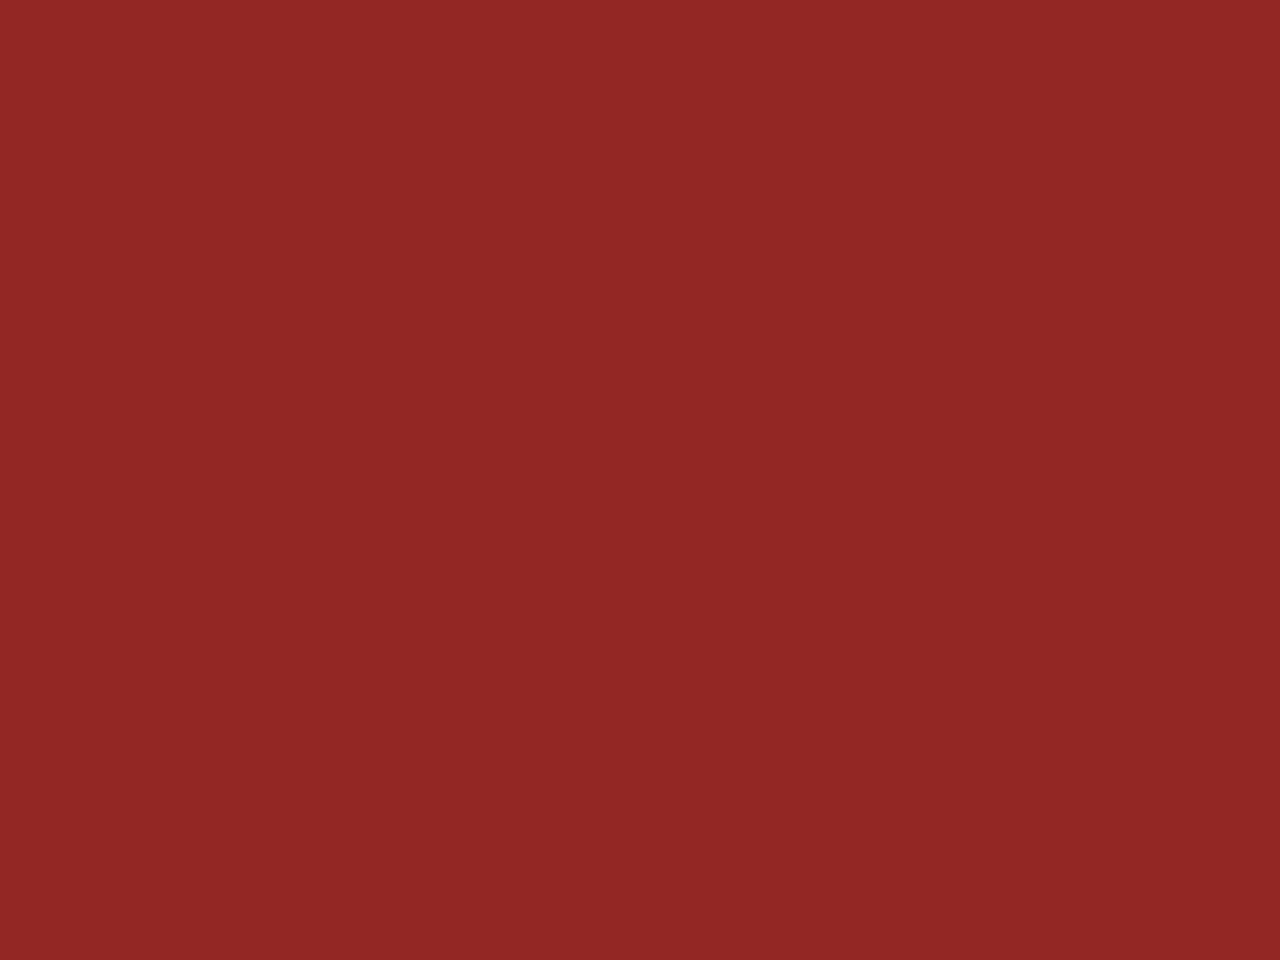 1280x960 Vivid Auburn Solid Color Background